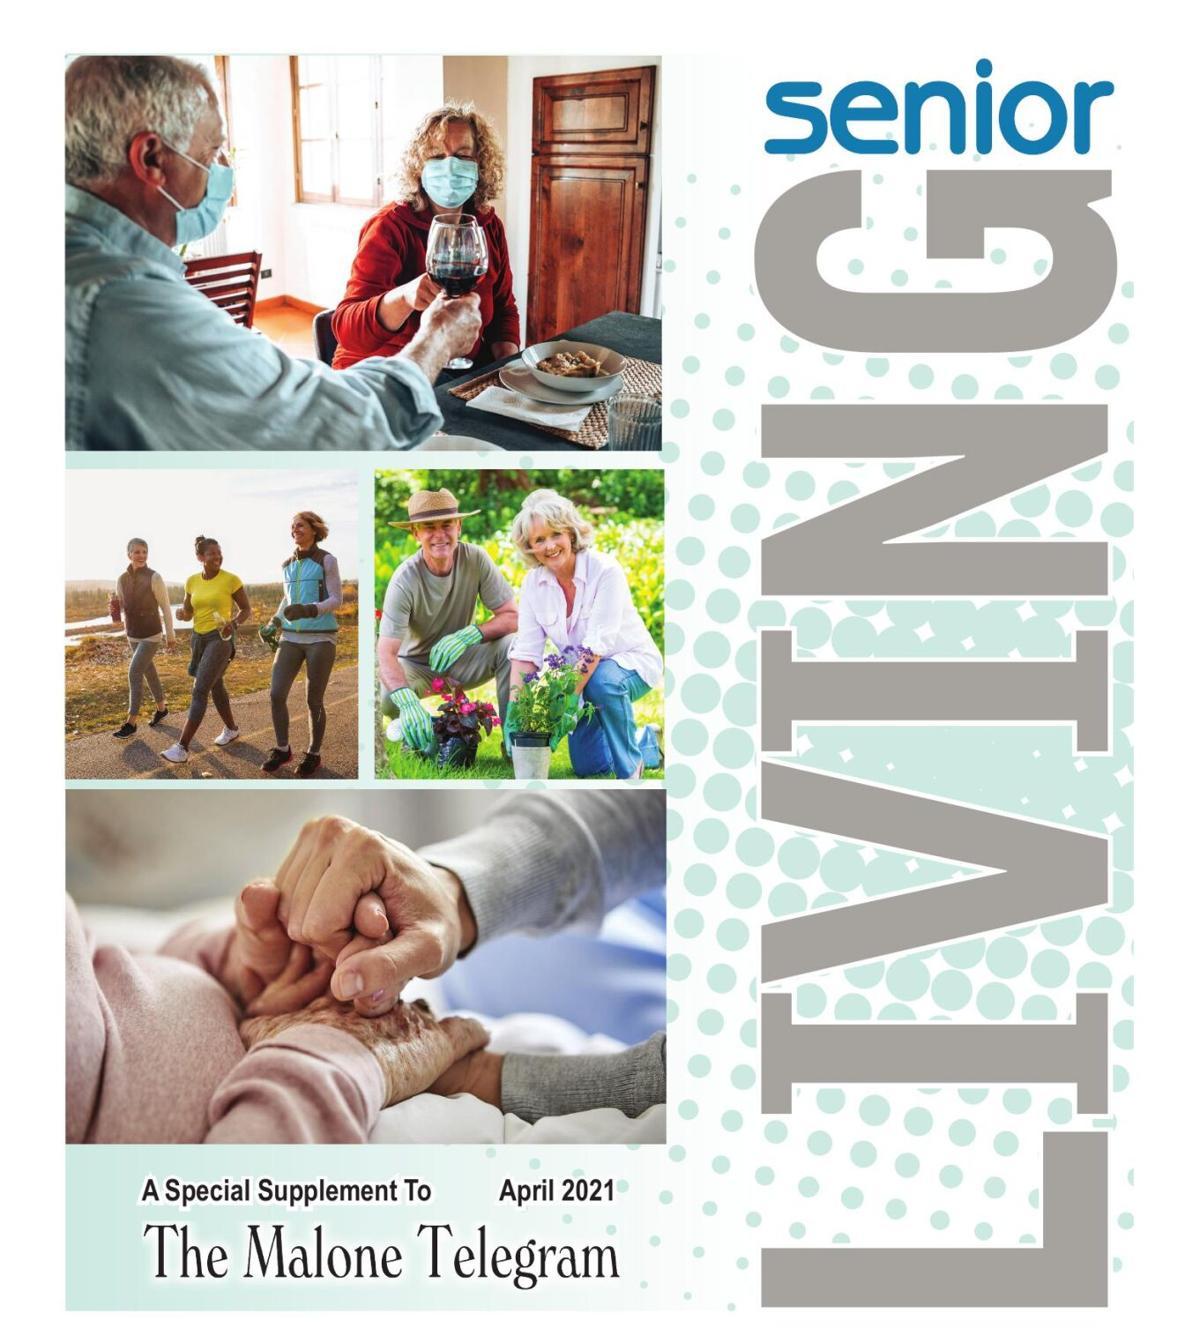 Senior Living (April 2021)